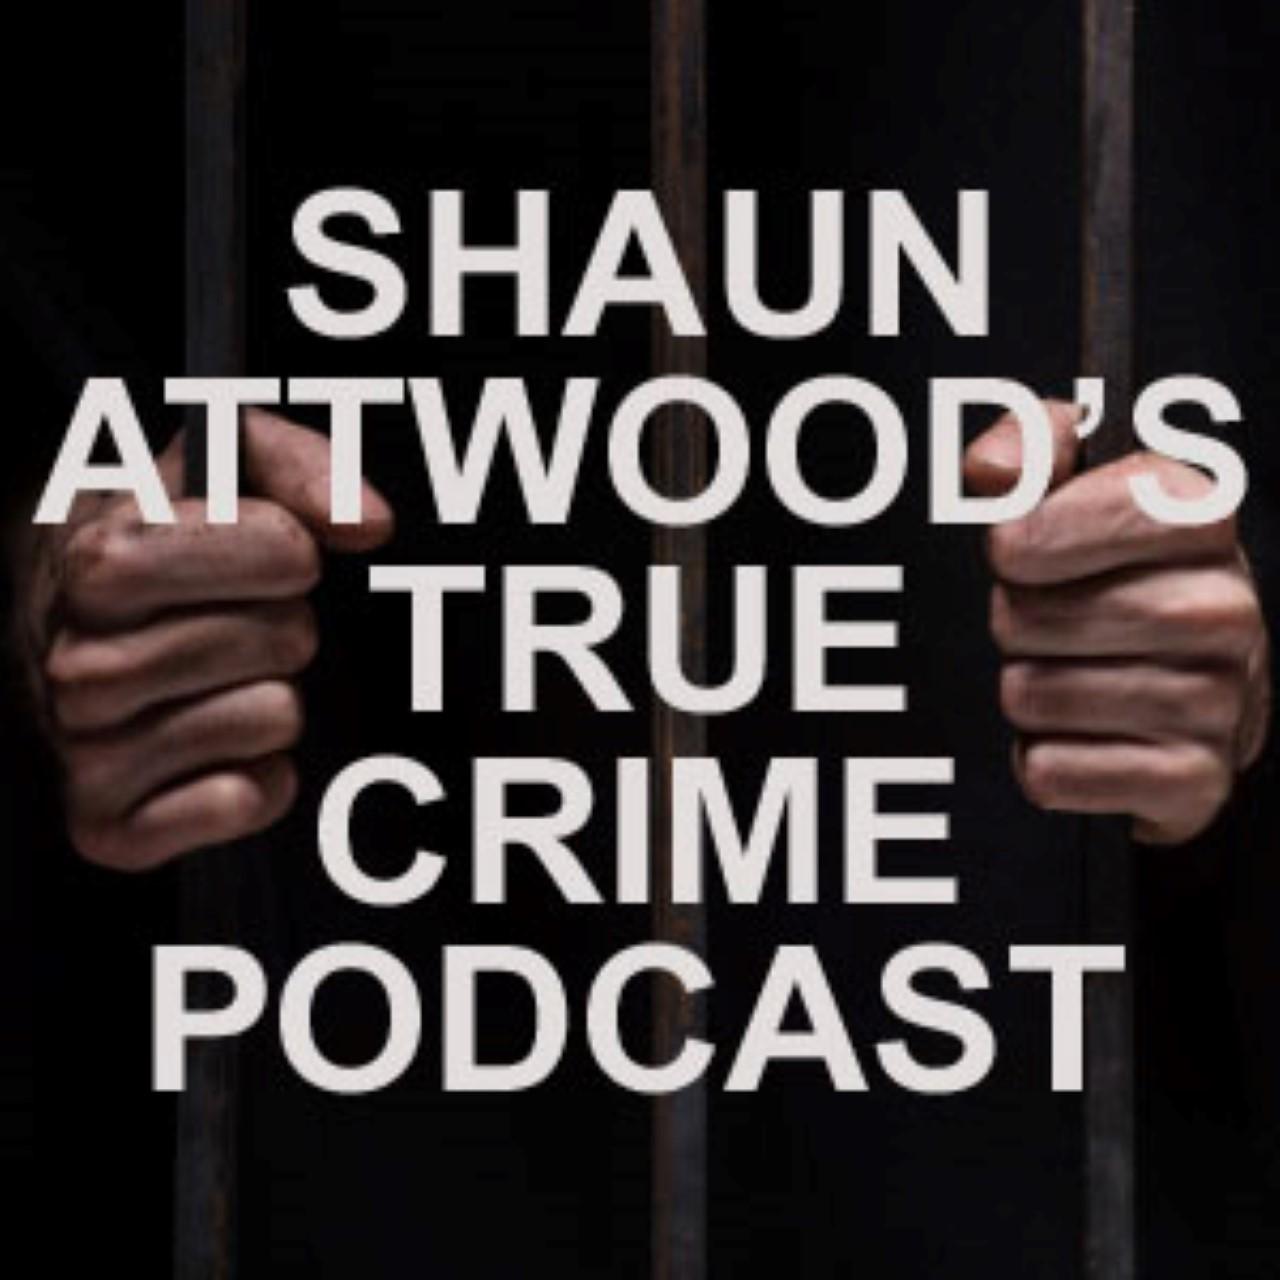 World's Strictest Prison: Fuchu, Japan: Steven Beattie | True Crime Podcast 122